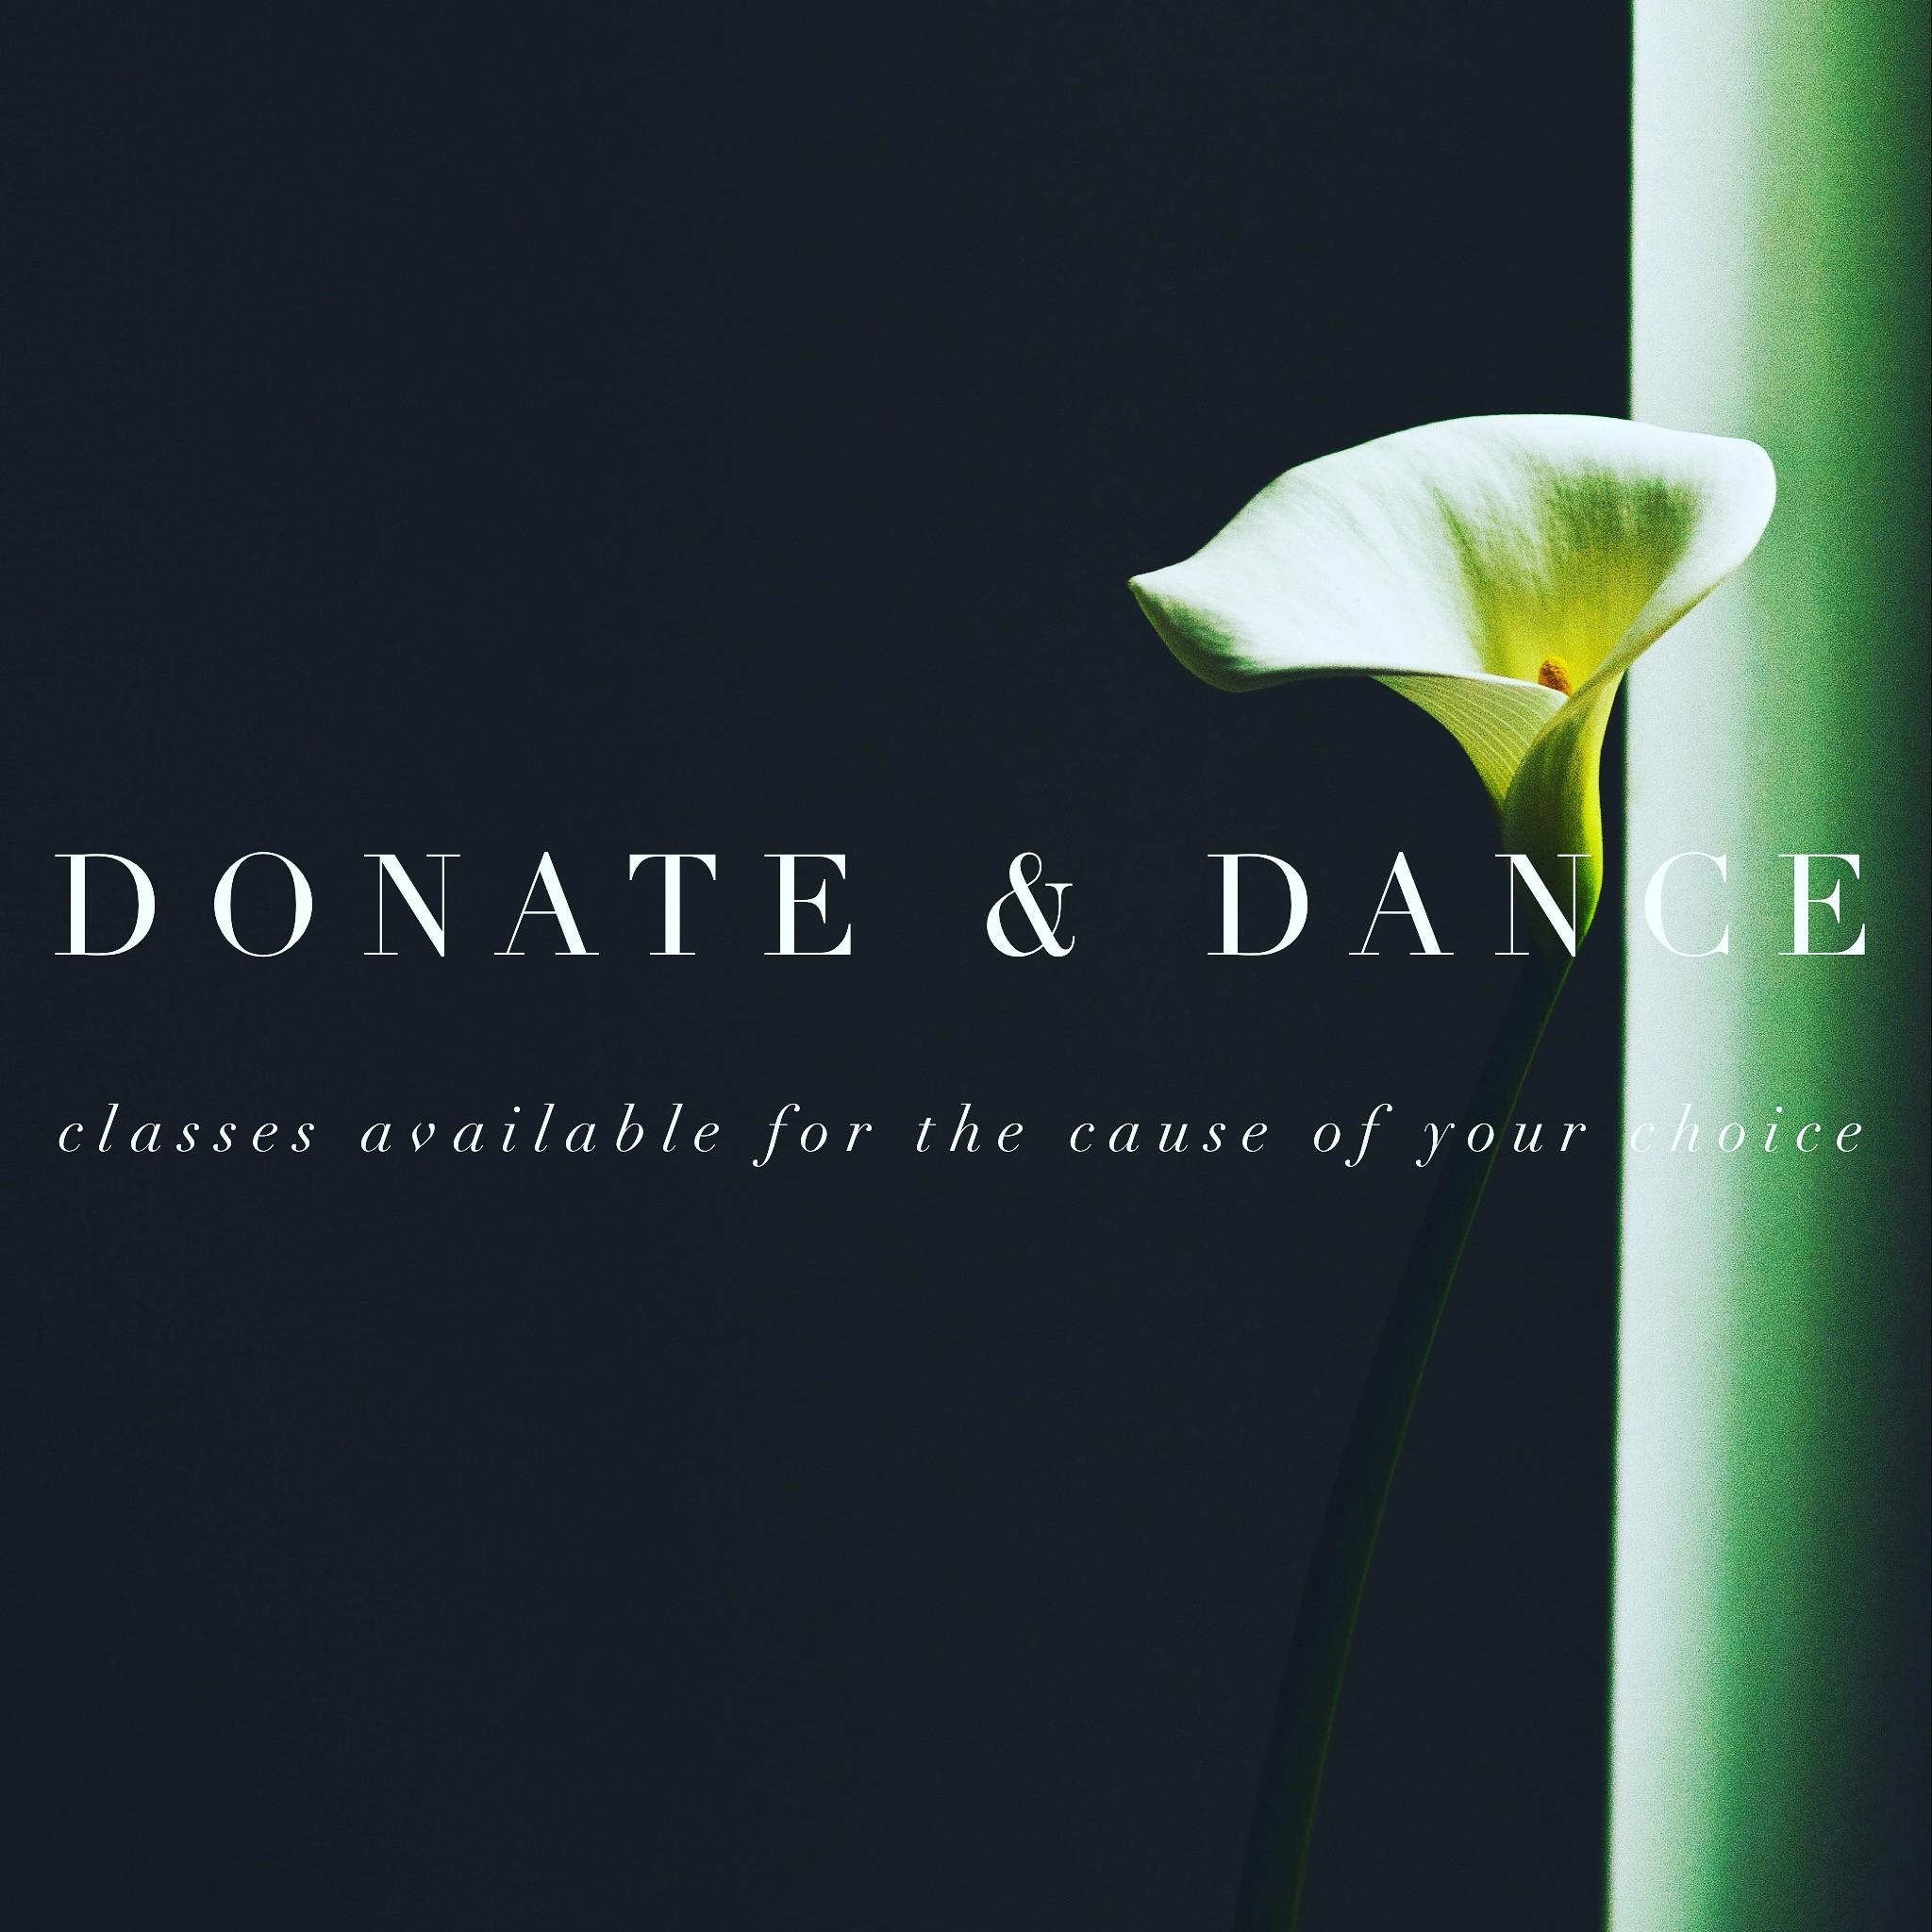 Donate & Dance